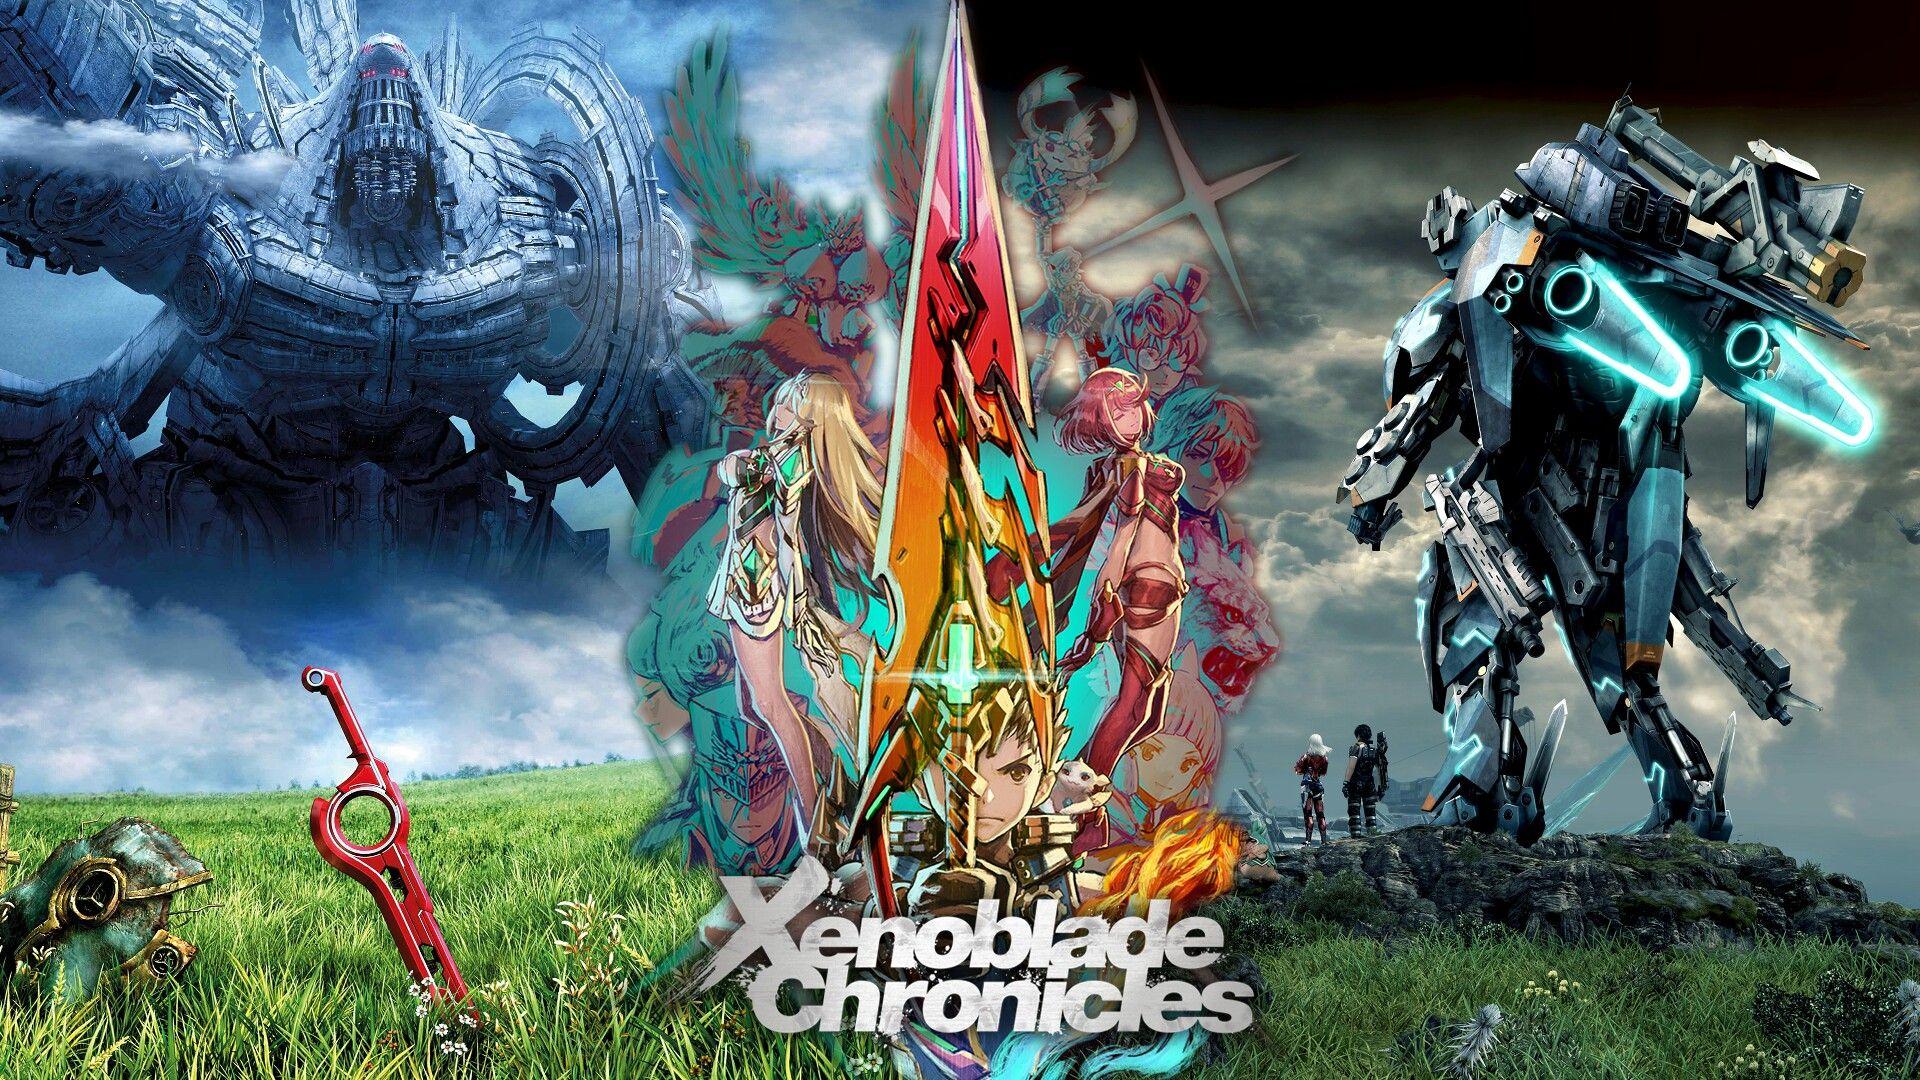 In 4k Xenoblade Chronicles 2 Xenoblade Chronicles Xenoblade Chronicles Wii